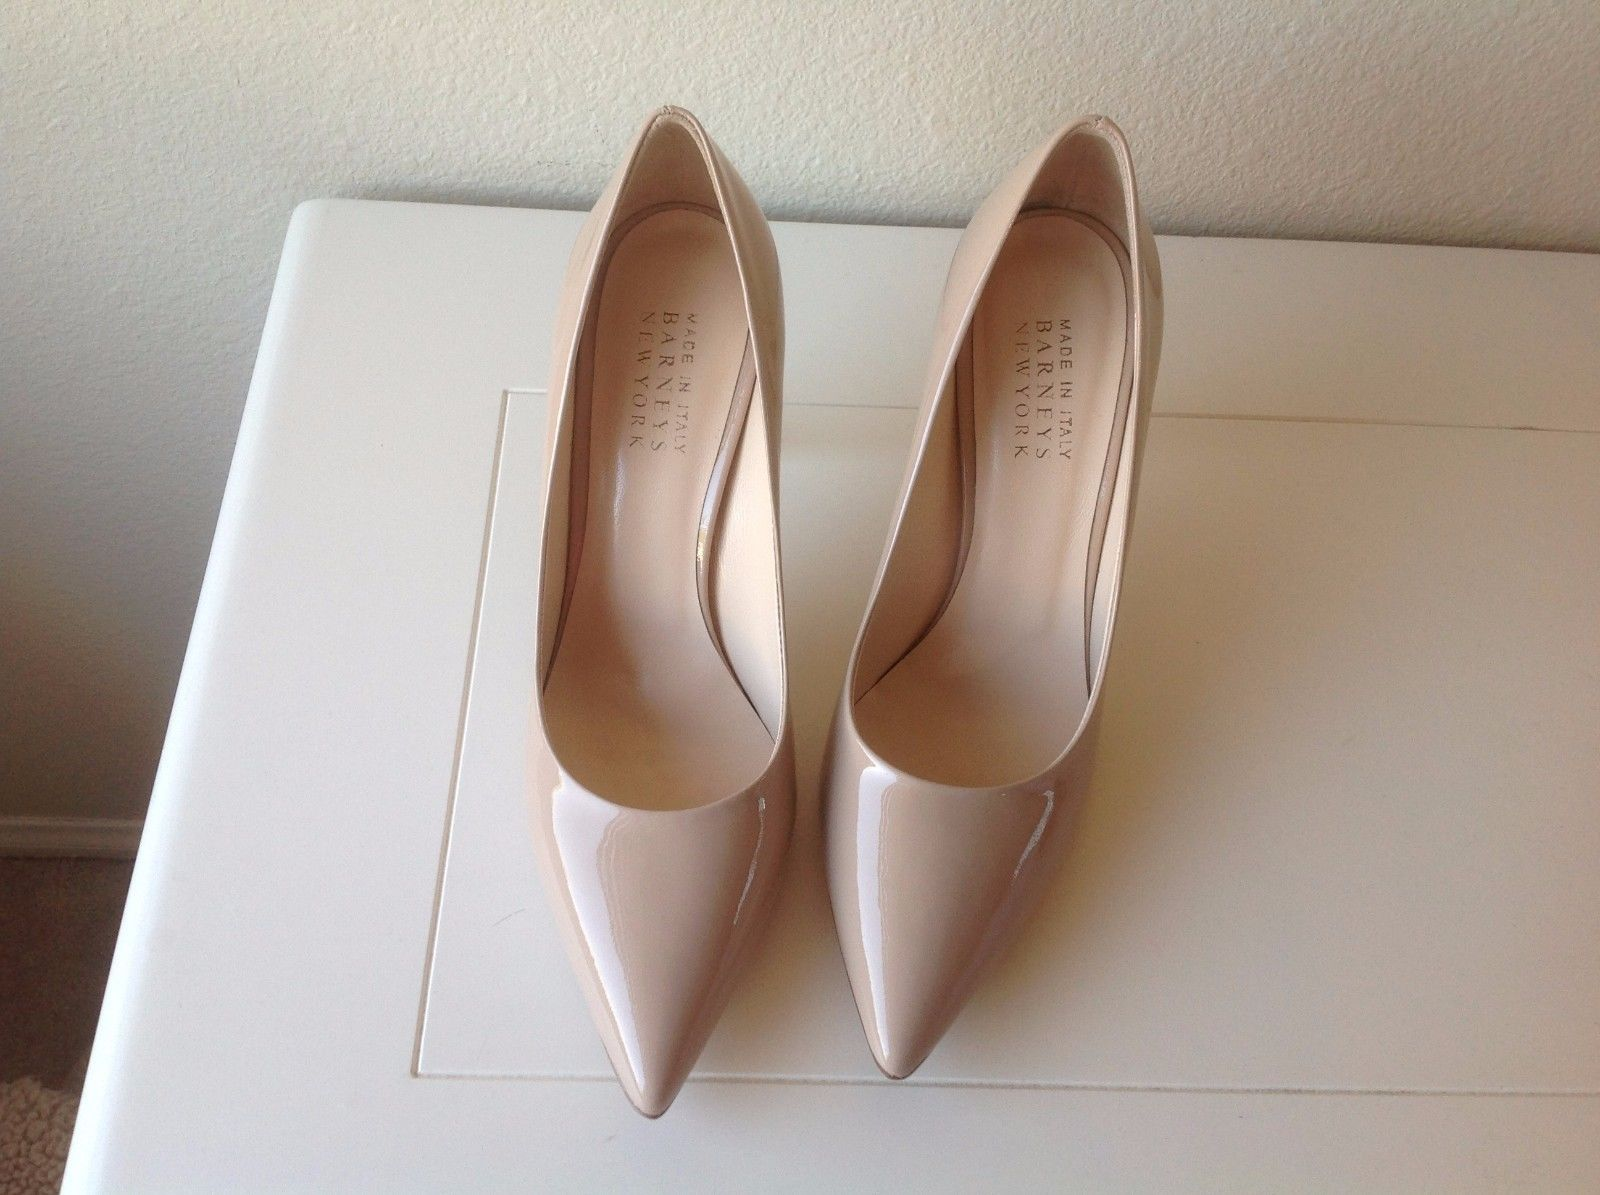 8fc4d313a Barneys New York Women's Classy Italian Shoes NUDE Patent Pumps Size 8 (38)  NIB